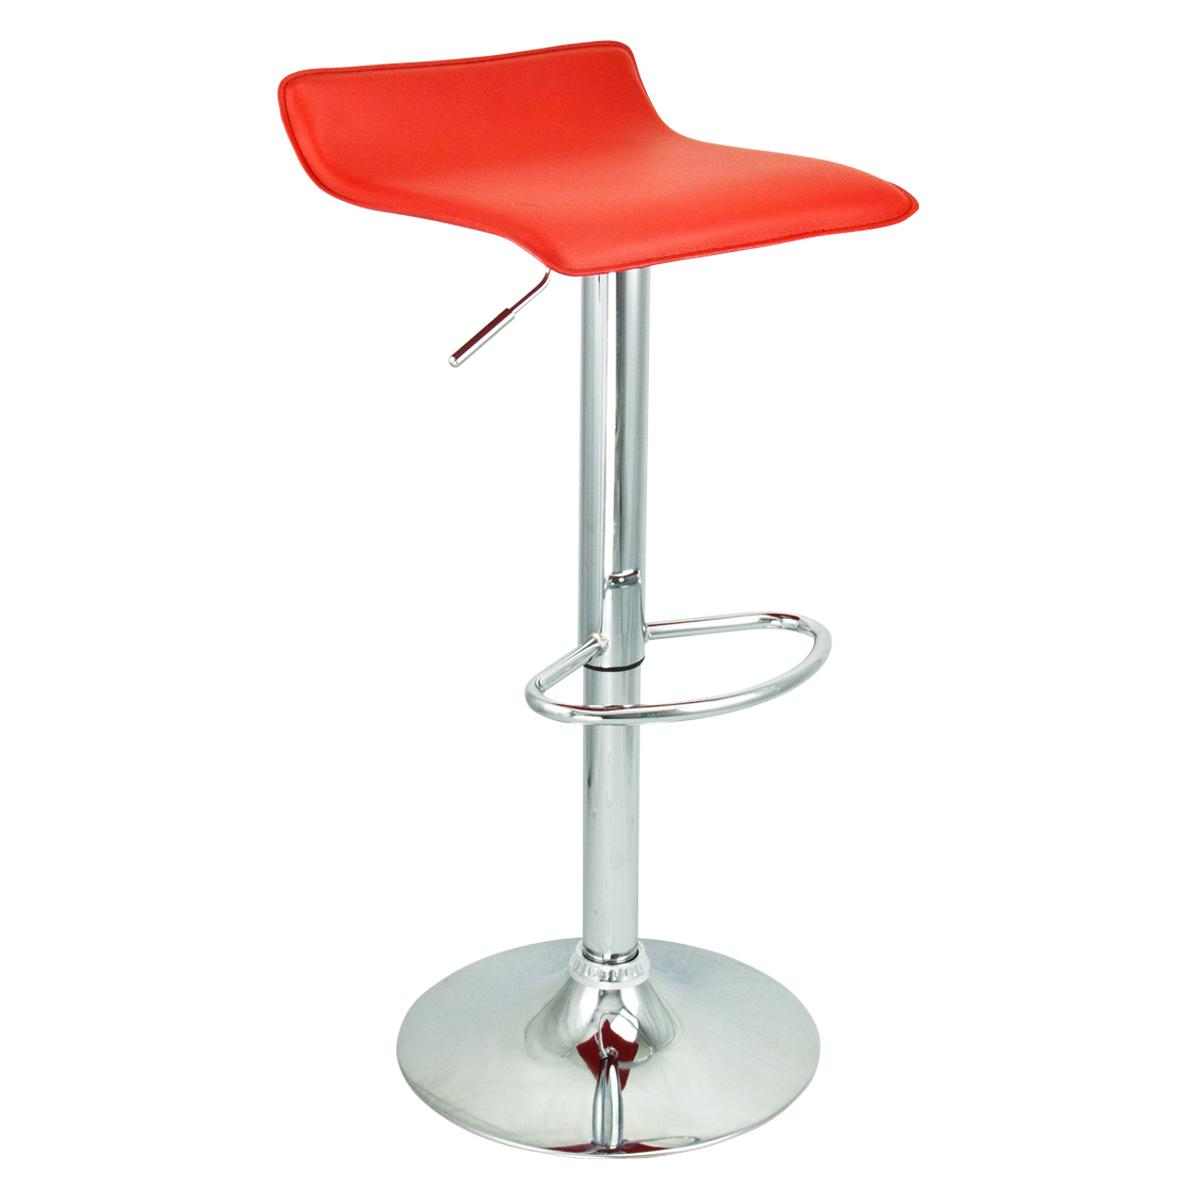 6 New Modern Bar Stool Red Swivel Bombo Chair Pub